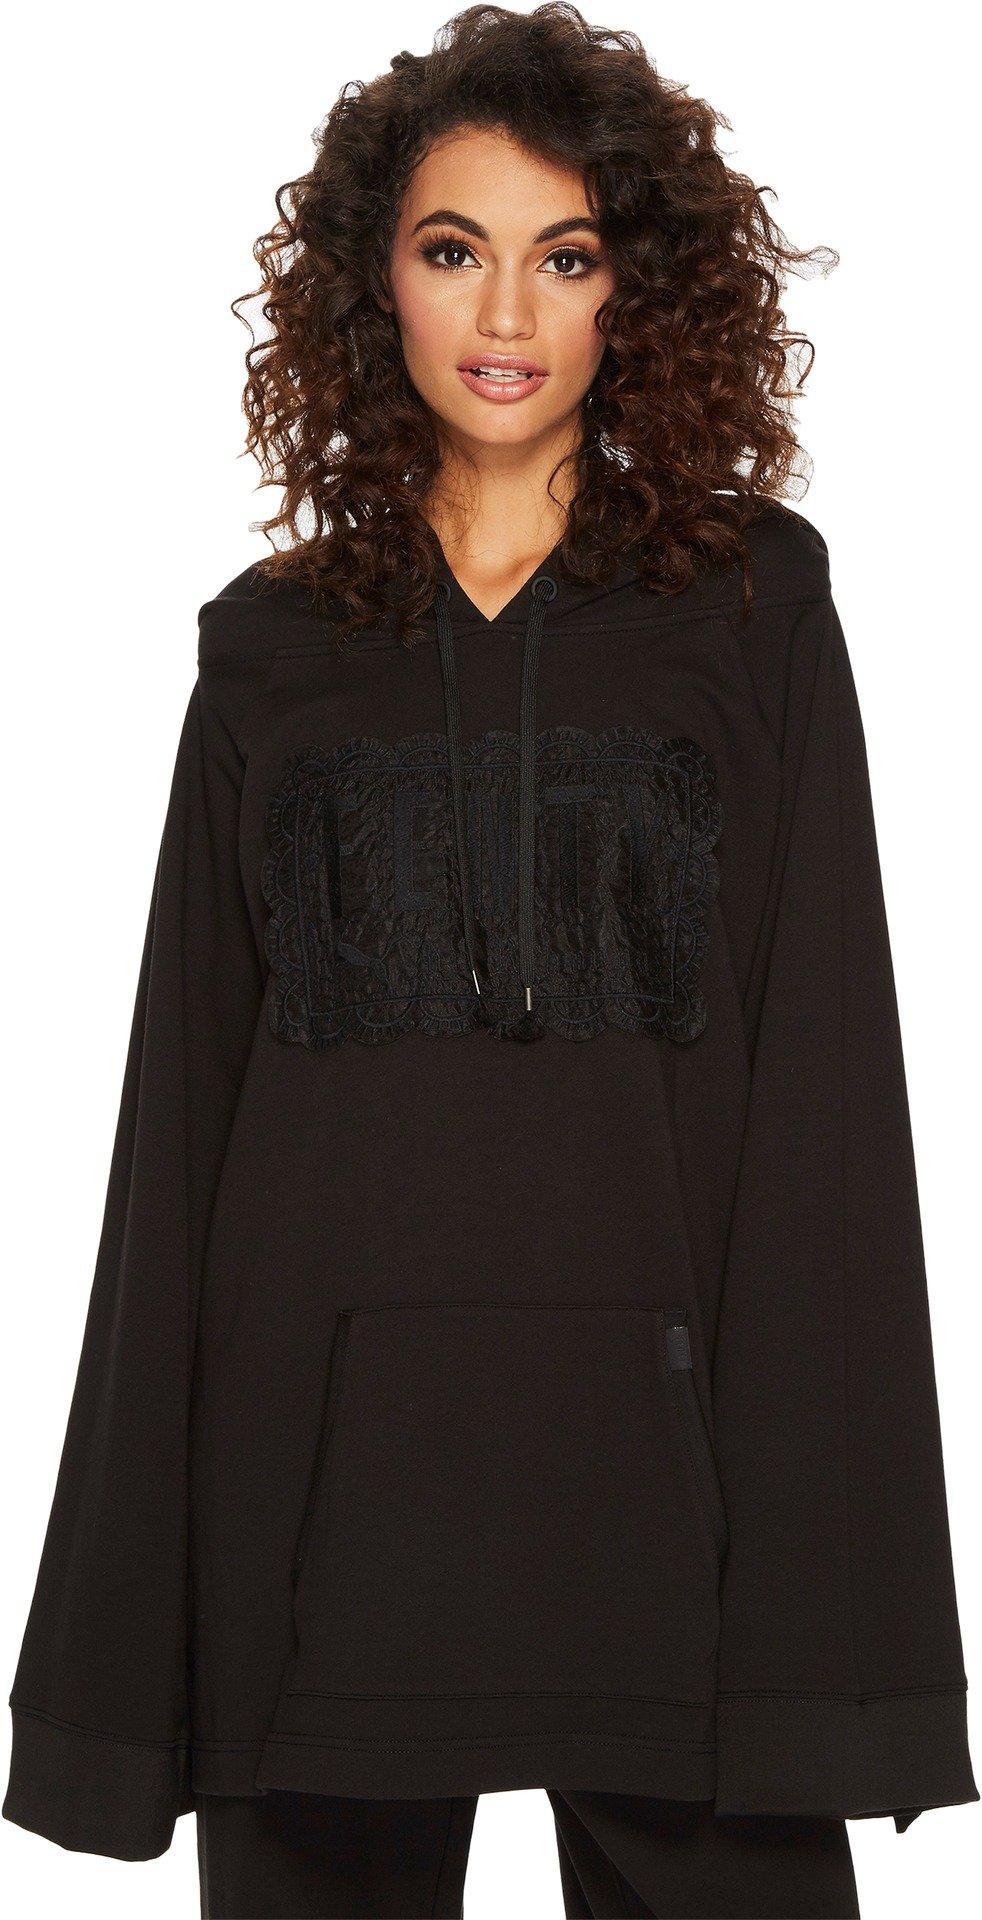 PUMA Women's Fenty Fleece Off The Shoulder Hoodie Cotton Black Small